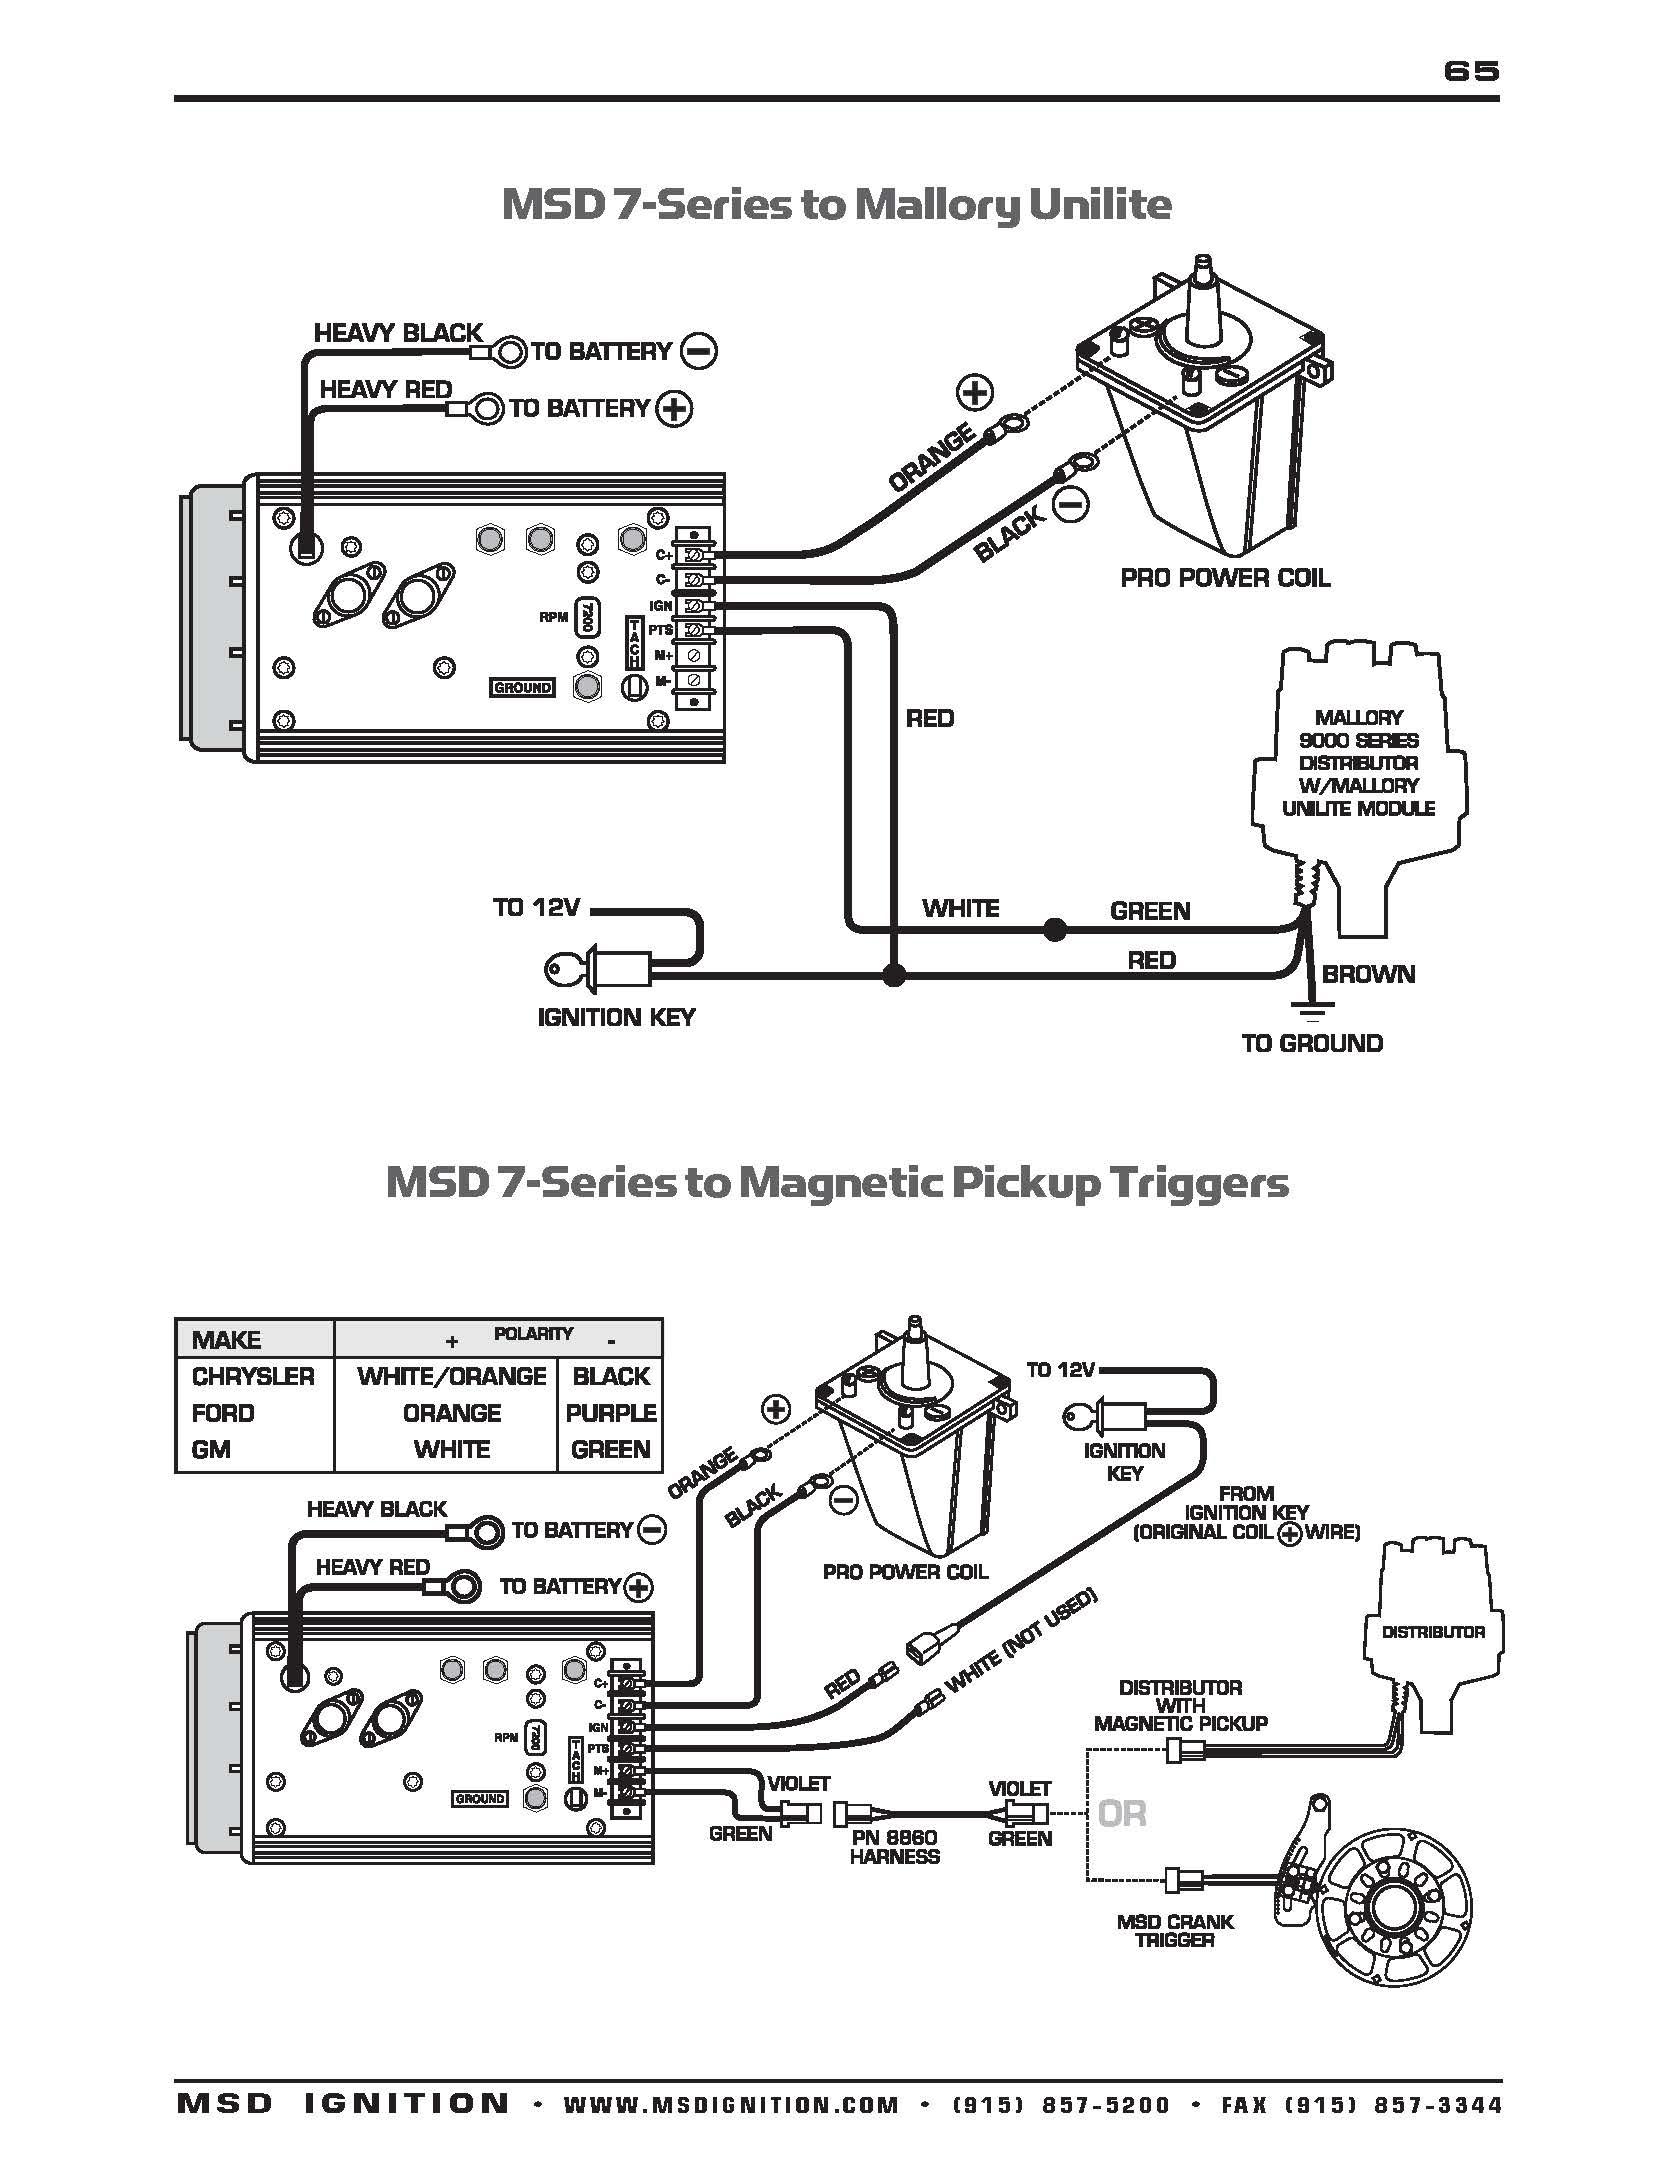 chevy hei distributor wiring diagram db 0271  wiring diagram along with chevy 350 hei distributor  wiring diagram along with chevy 350 hei